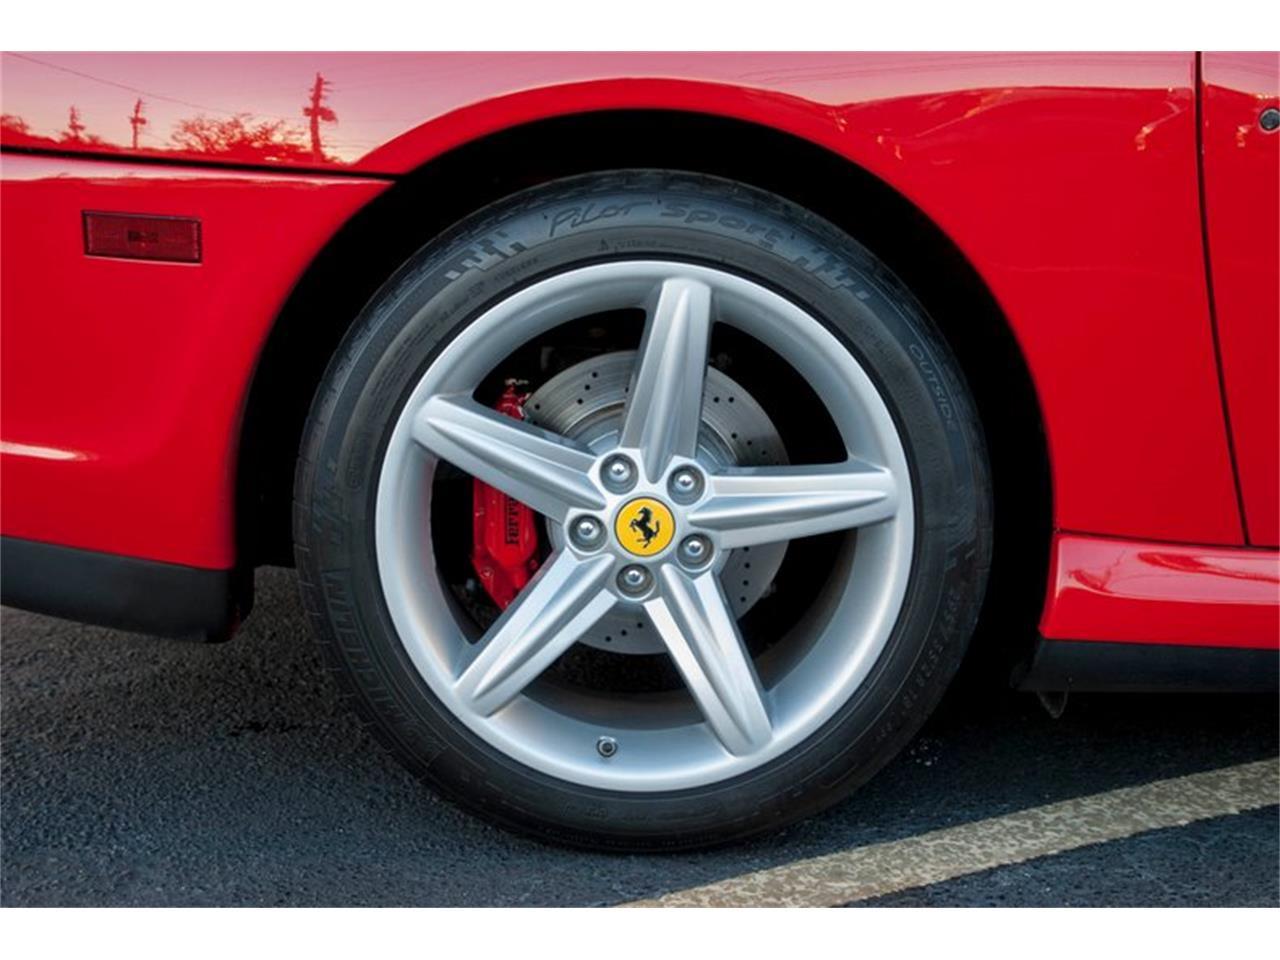 Large Picture of 2002 Ferrari 575 located in Florida - $99,900.00 - QN0J